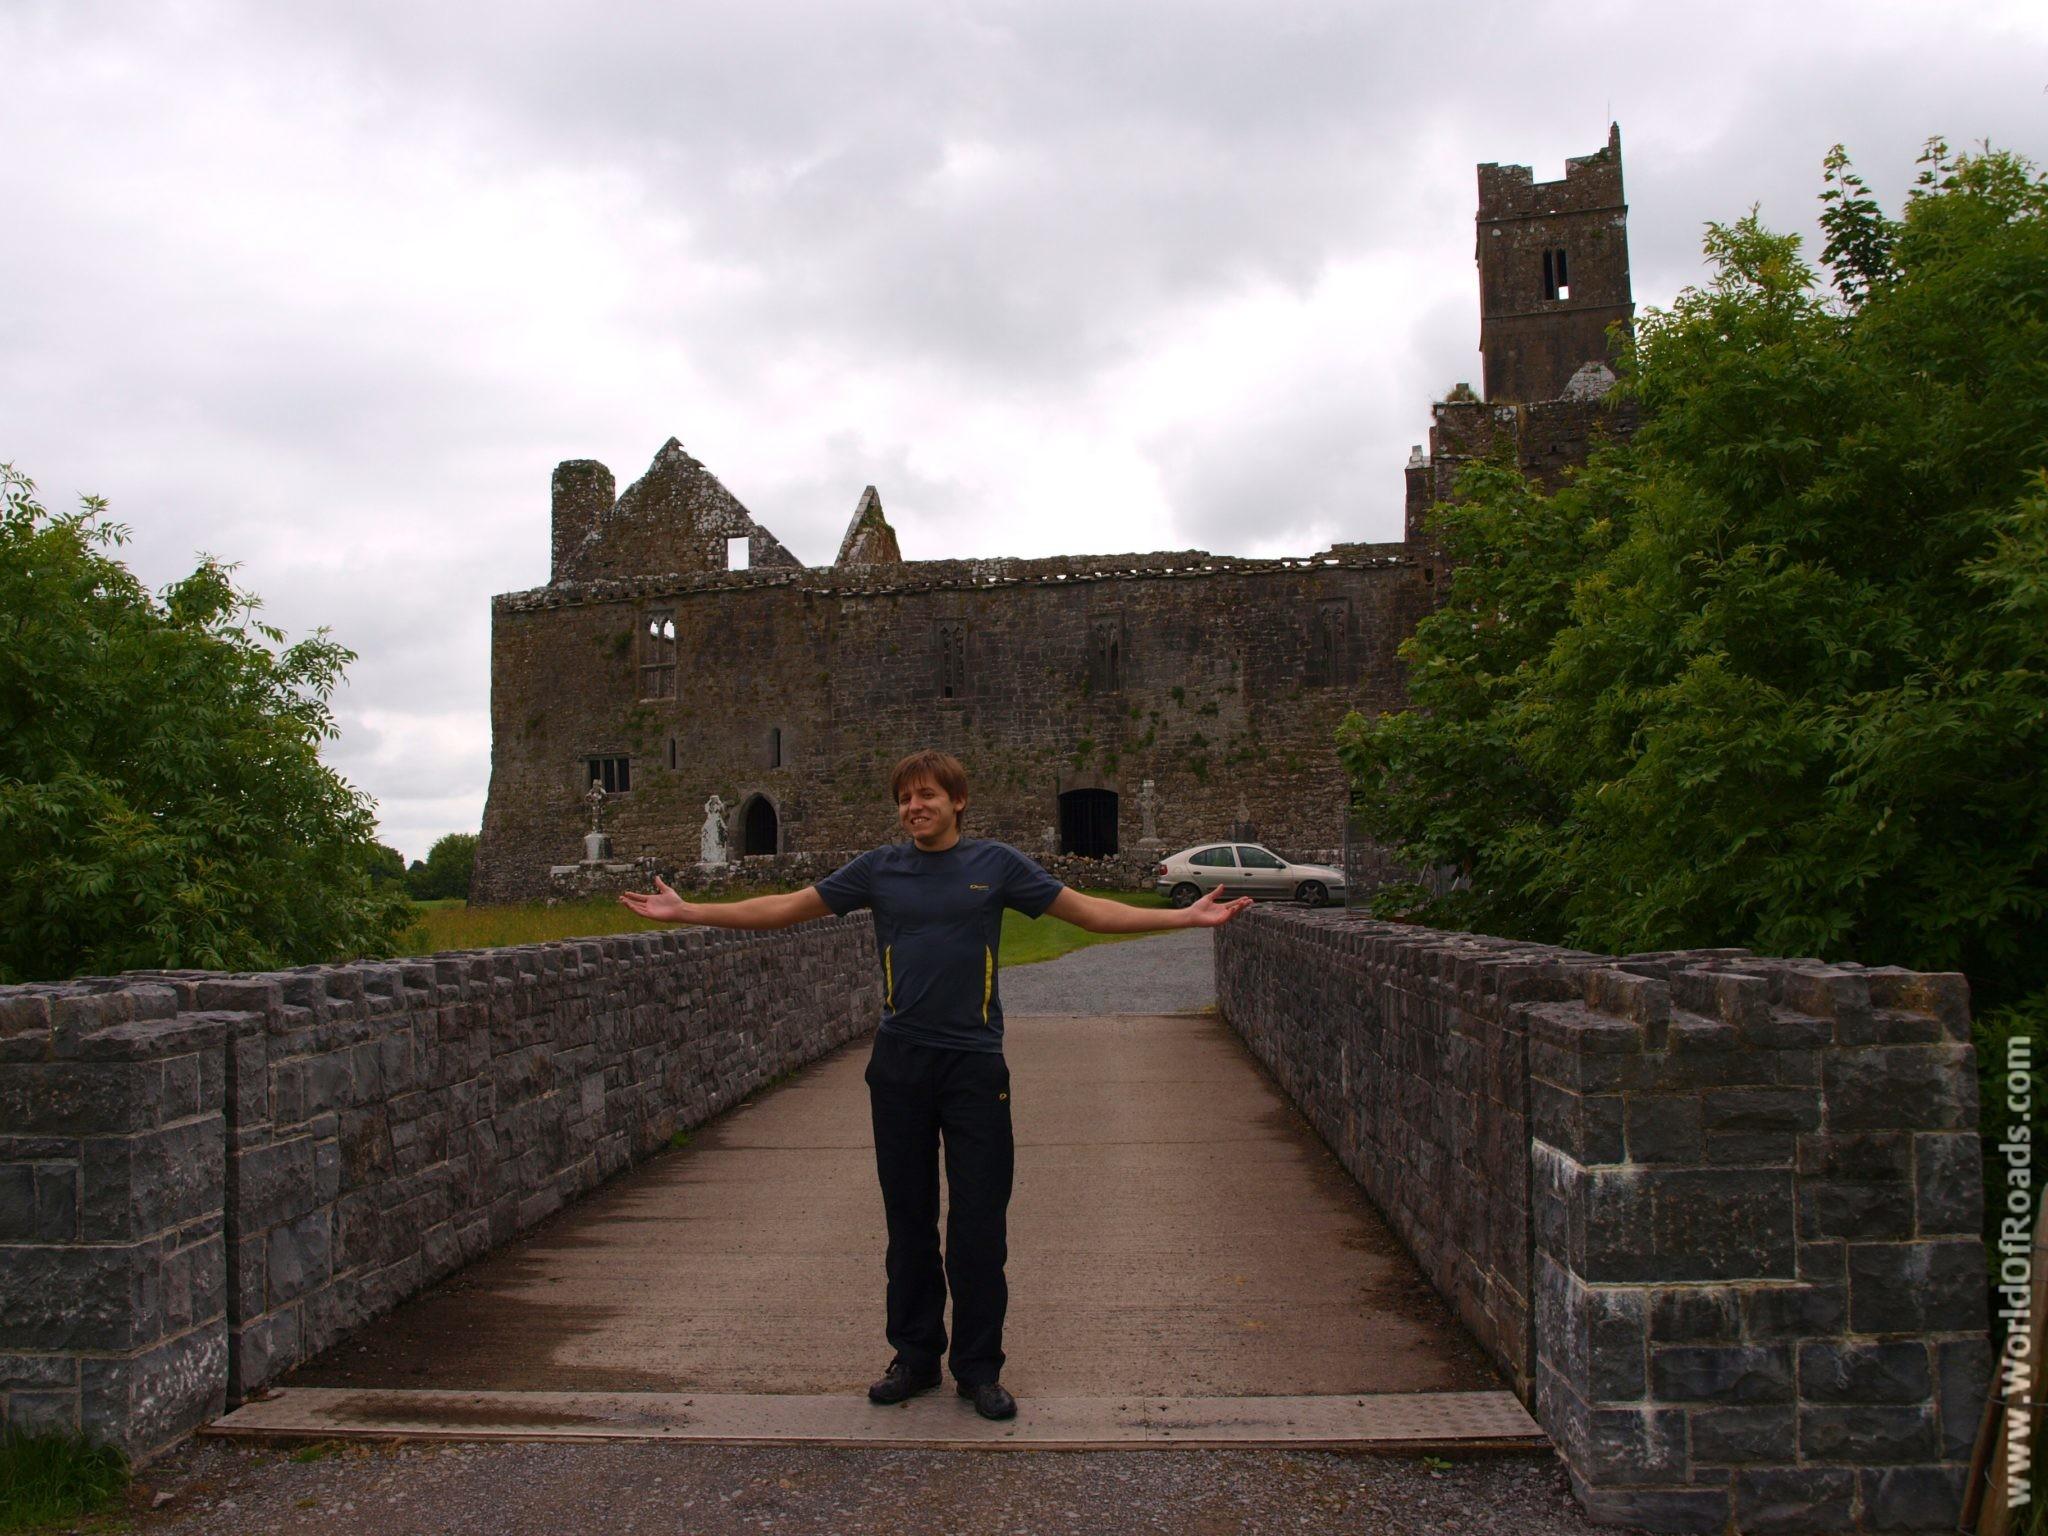 Мост. Аббатство Квин. Графство Клэр. Ирландия.